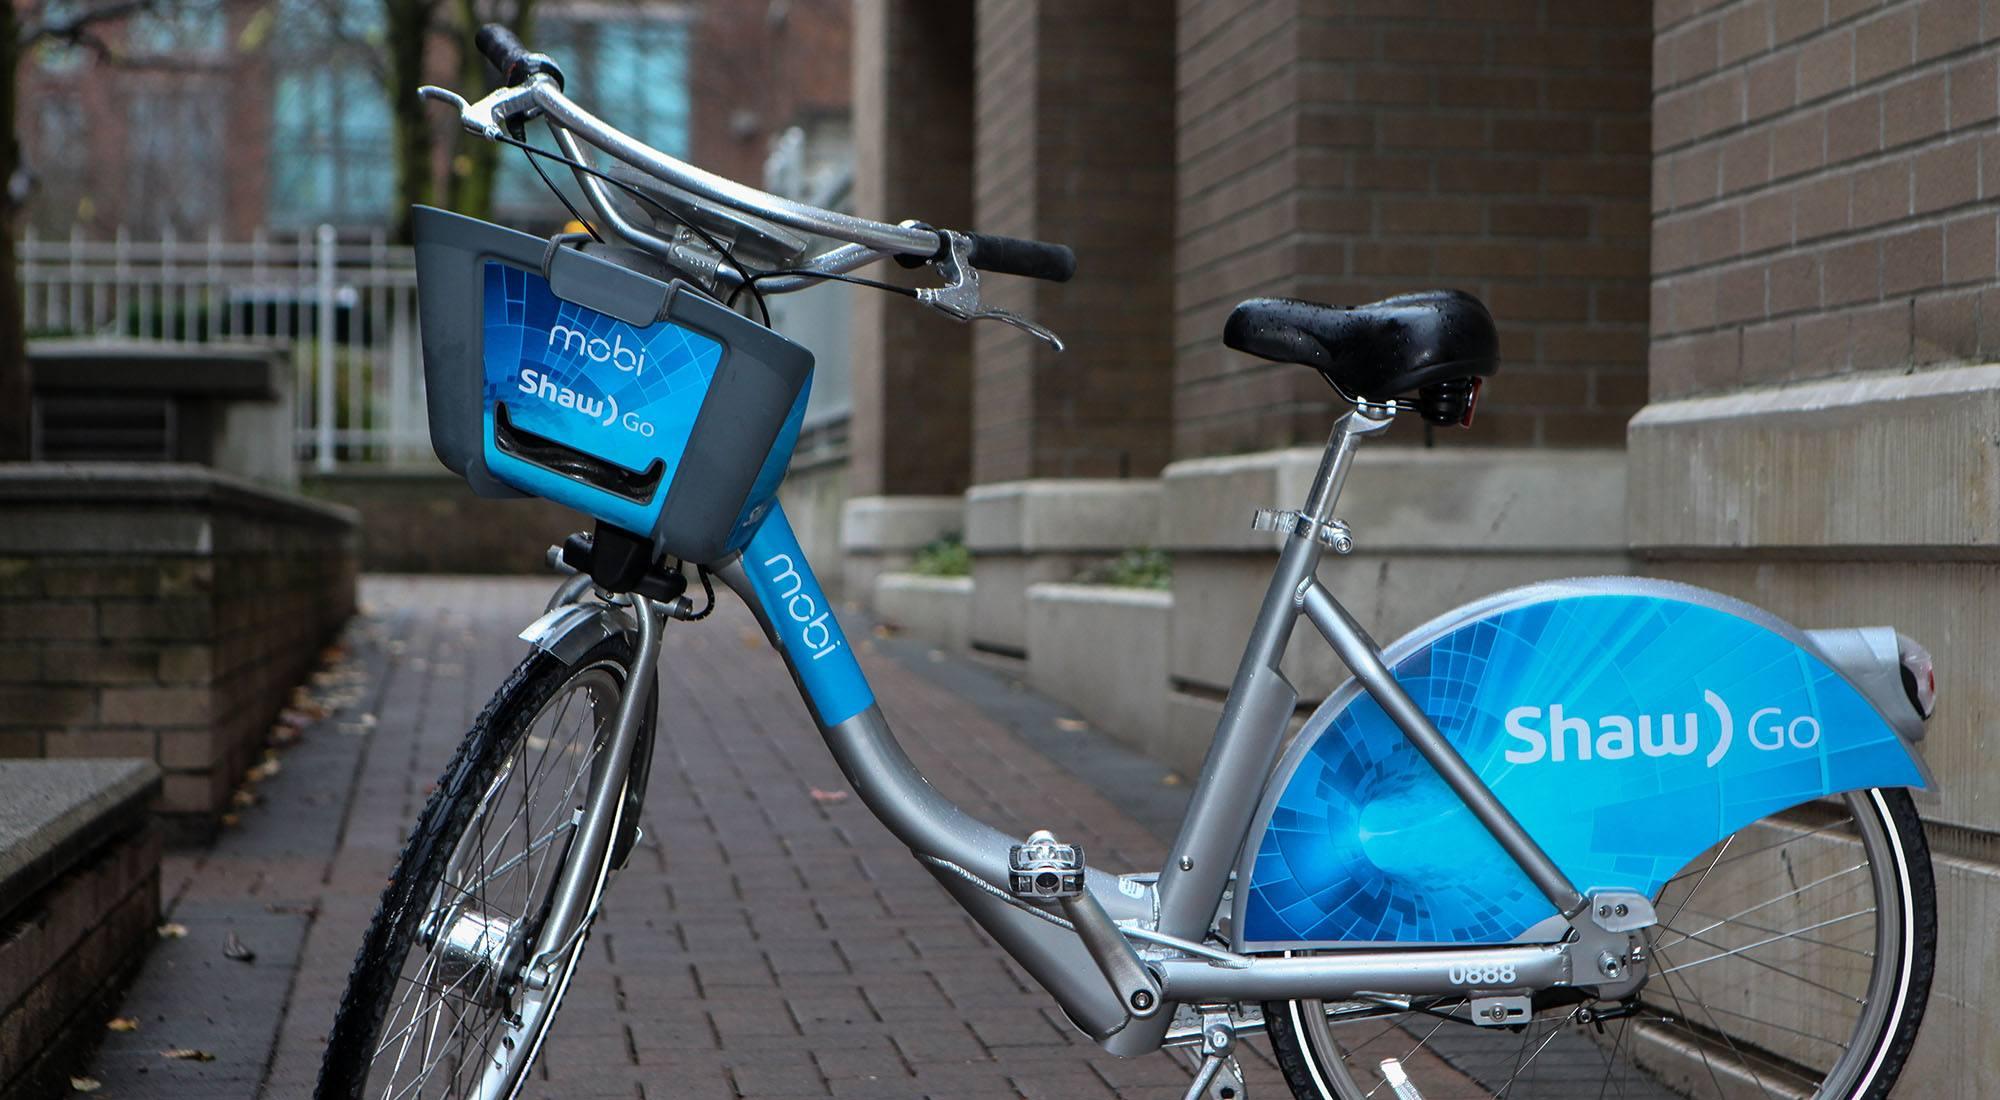 The rebranded mobi by shaw go bike david niddrie